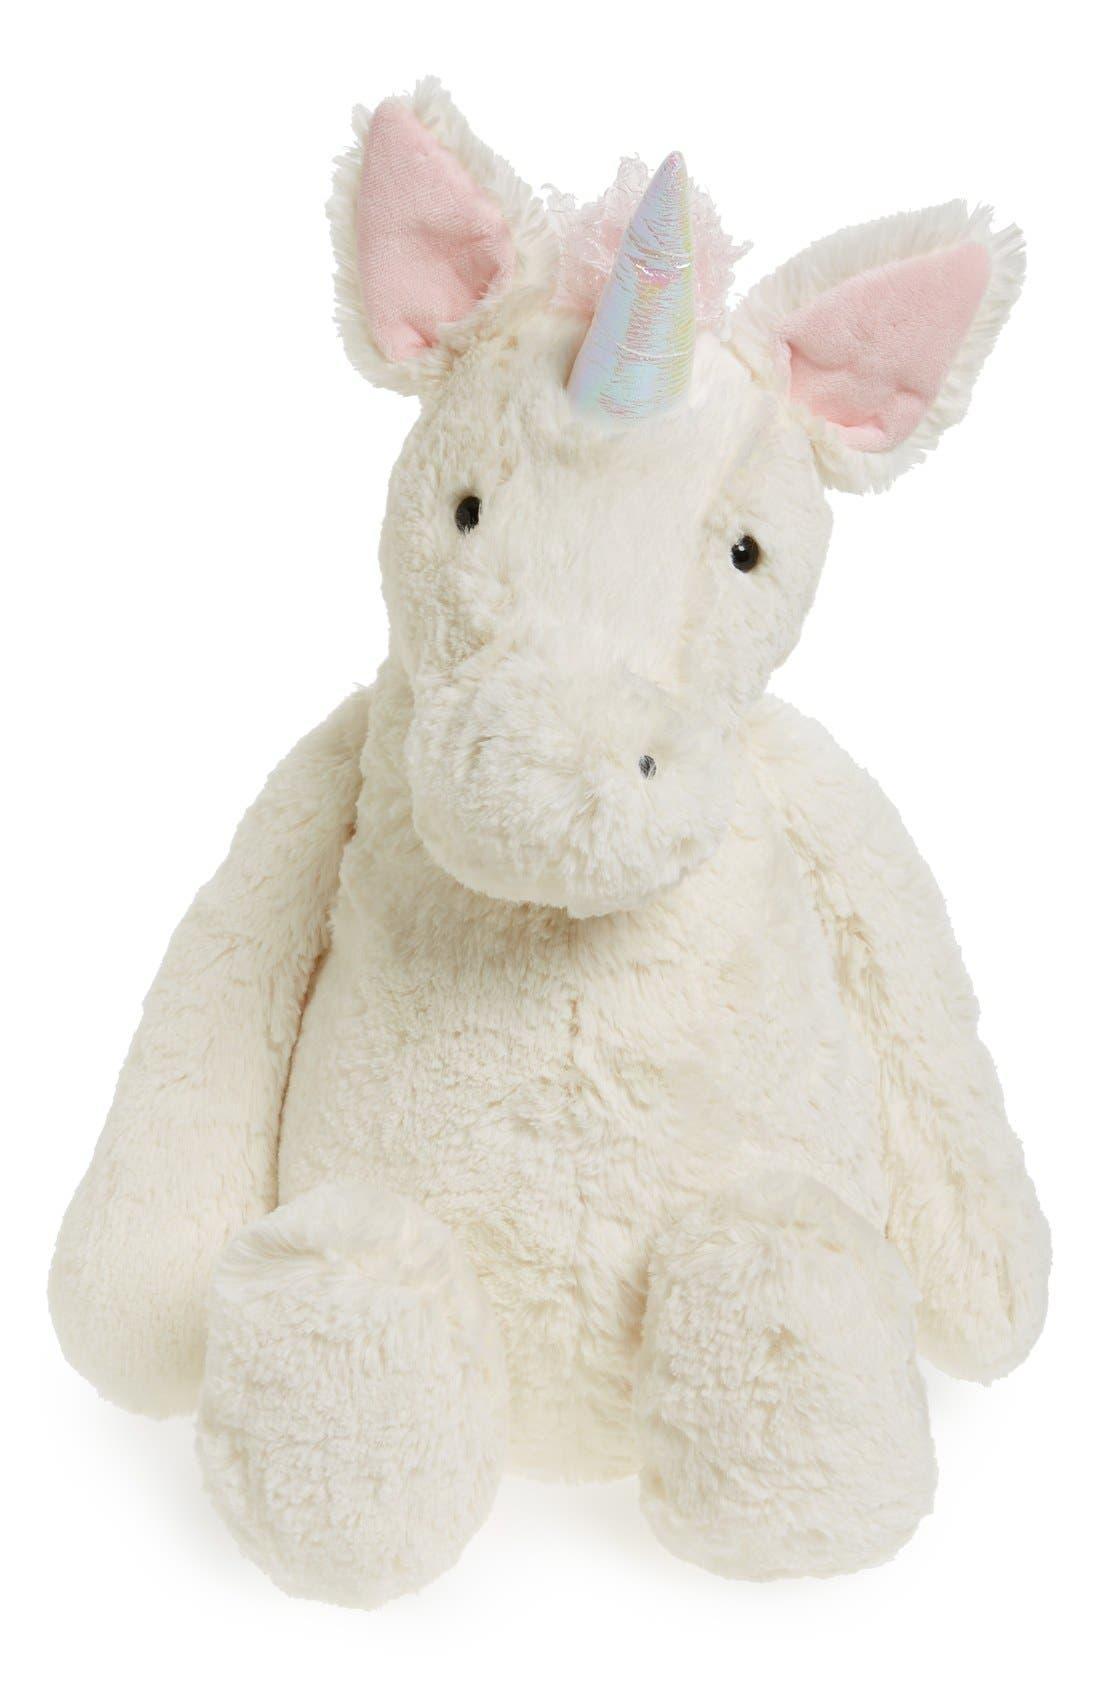 Alternate Image 1 Selected - Jellycat 'Huge Bashful Unicorn' Stuffed Animal